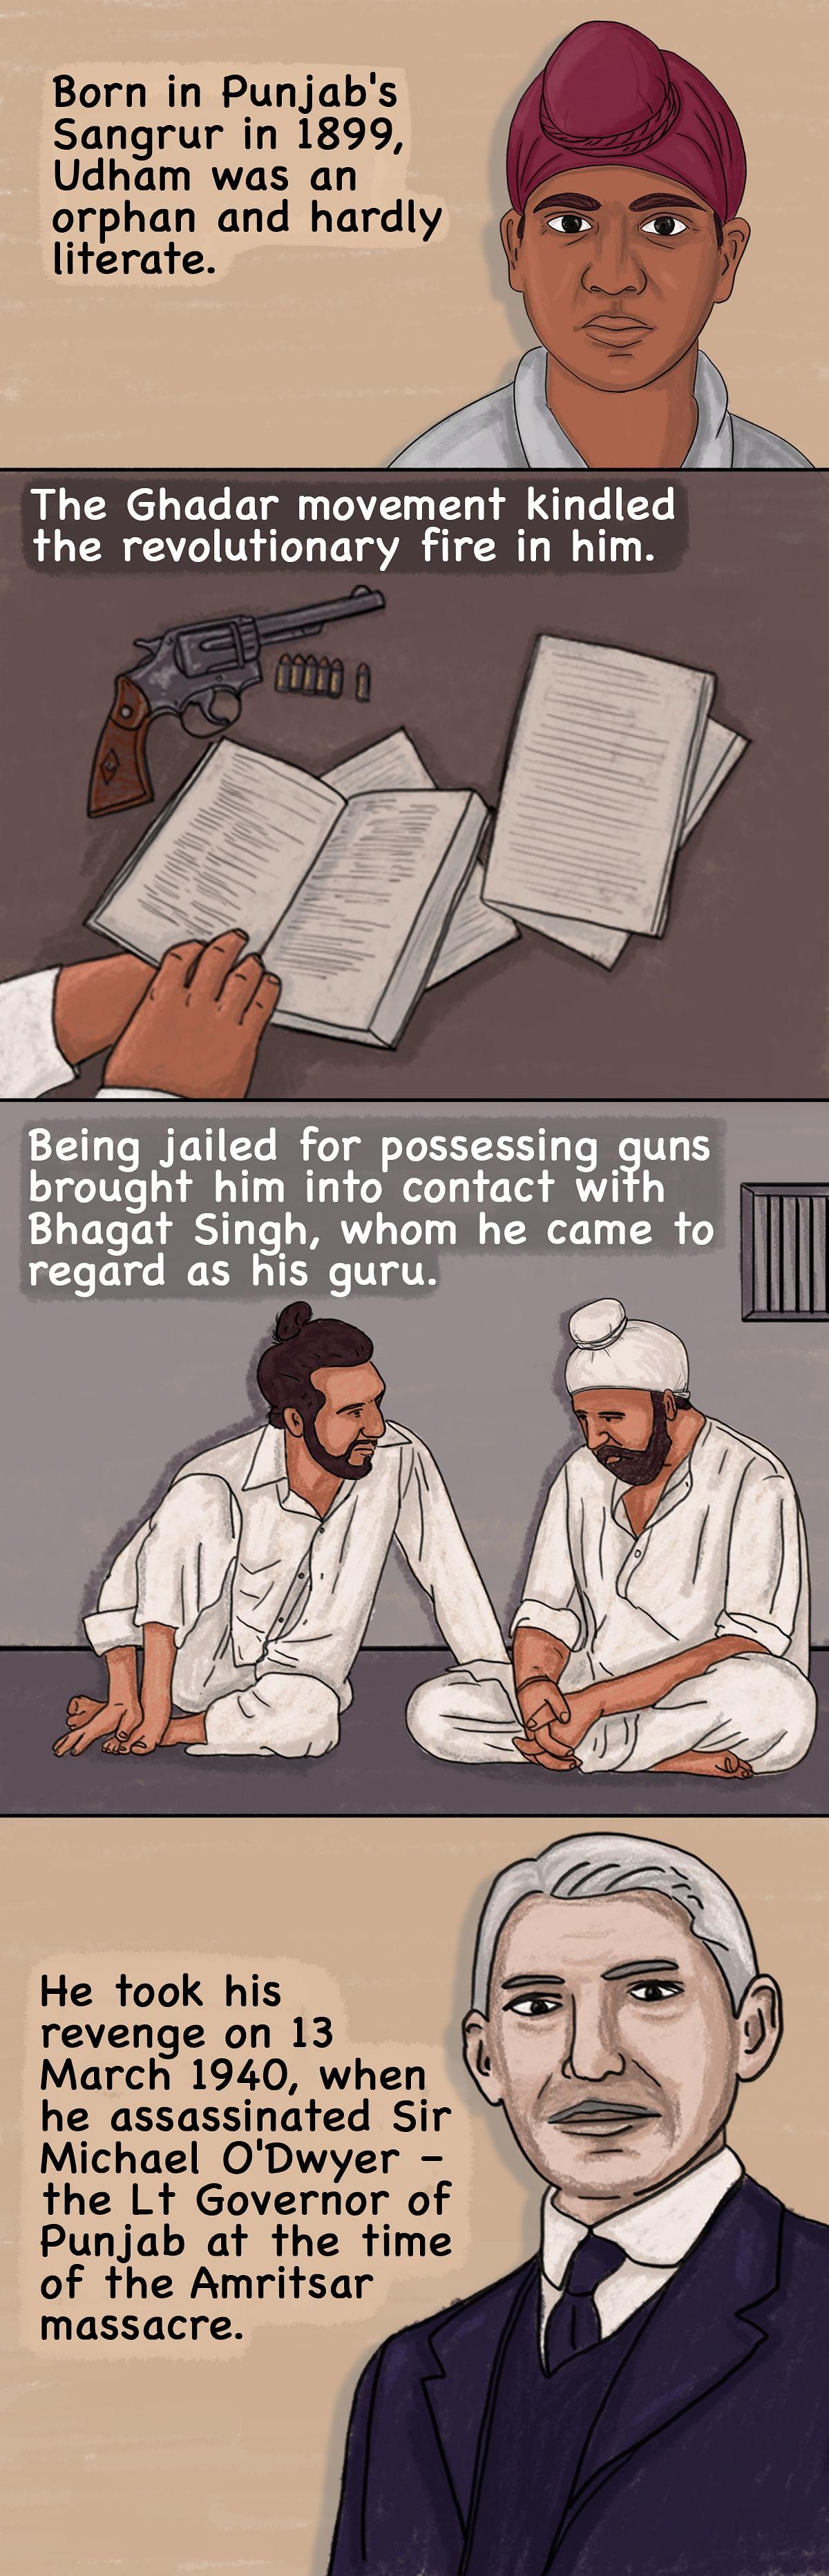 Sardar Udham Singh: A Life Devoted to Avenging Jallianwala Bagh Massacre